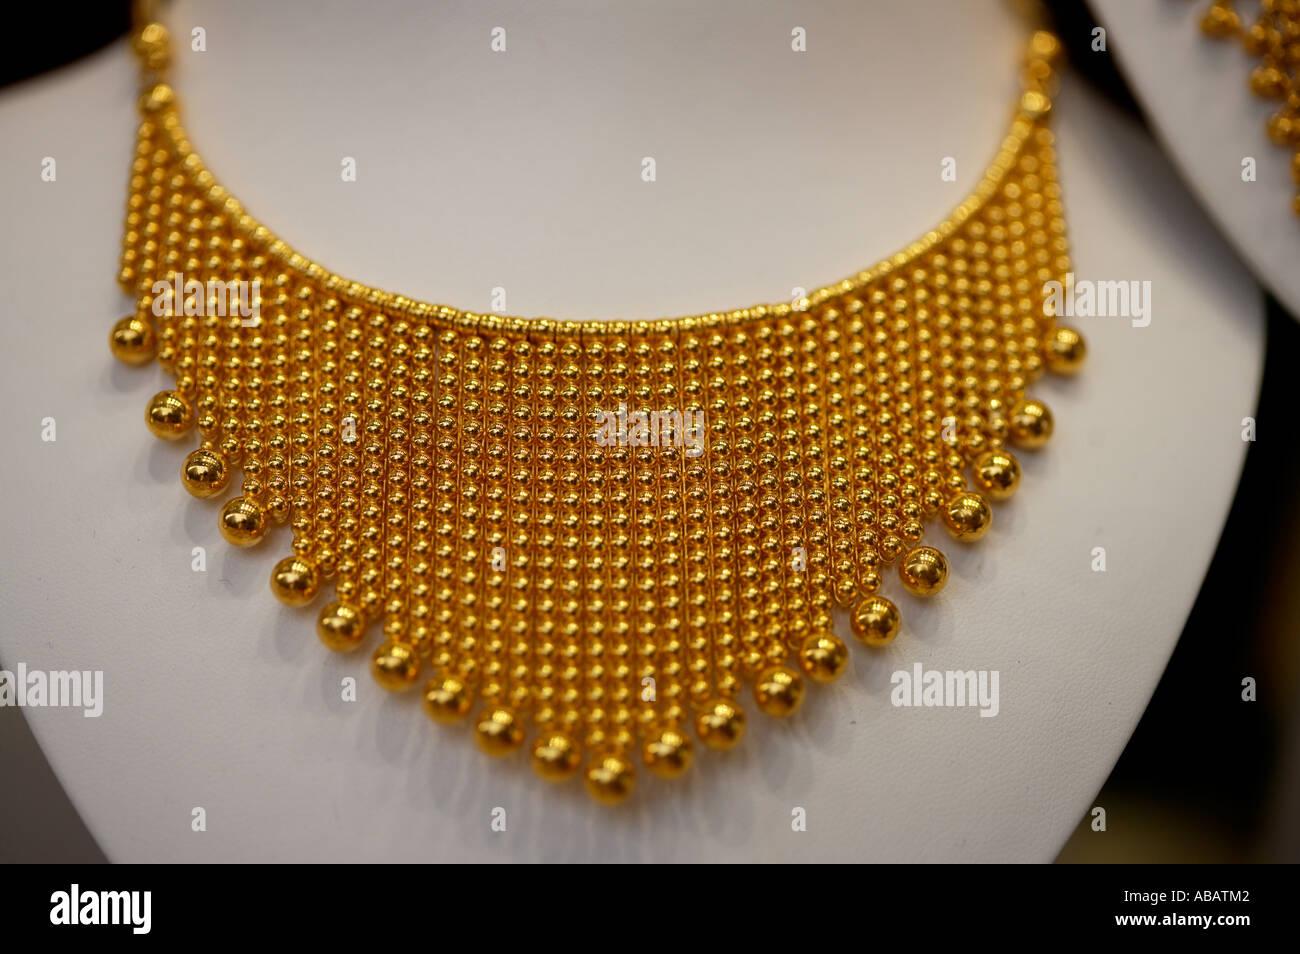 Dubai, Gold Souk, Necklace Stock Photo: 7333953 - Alamy